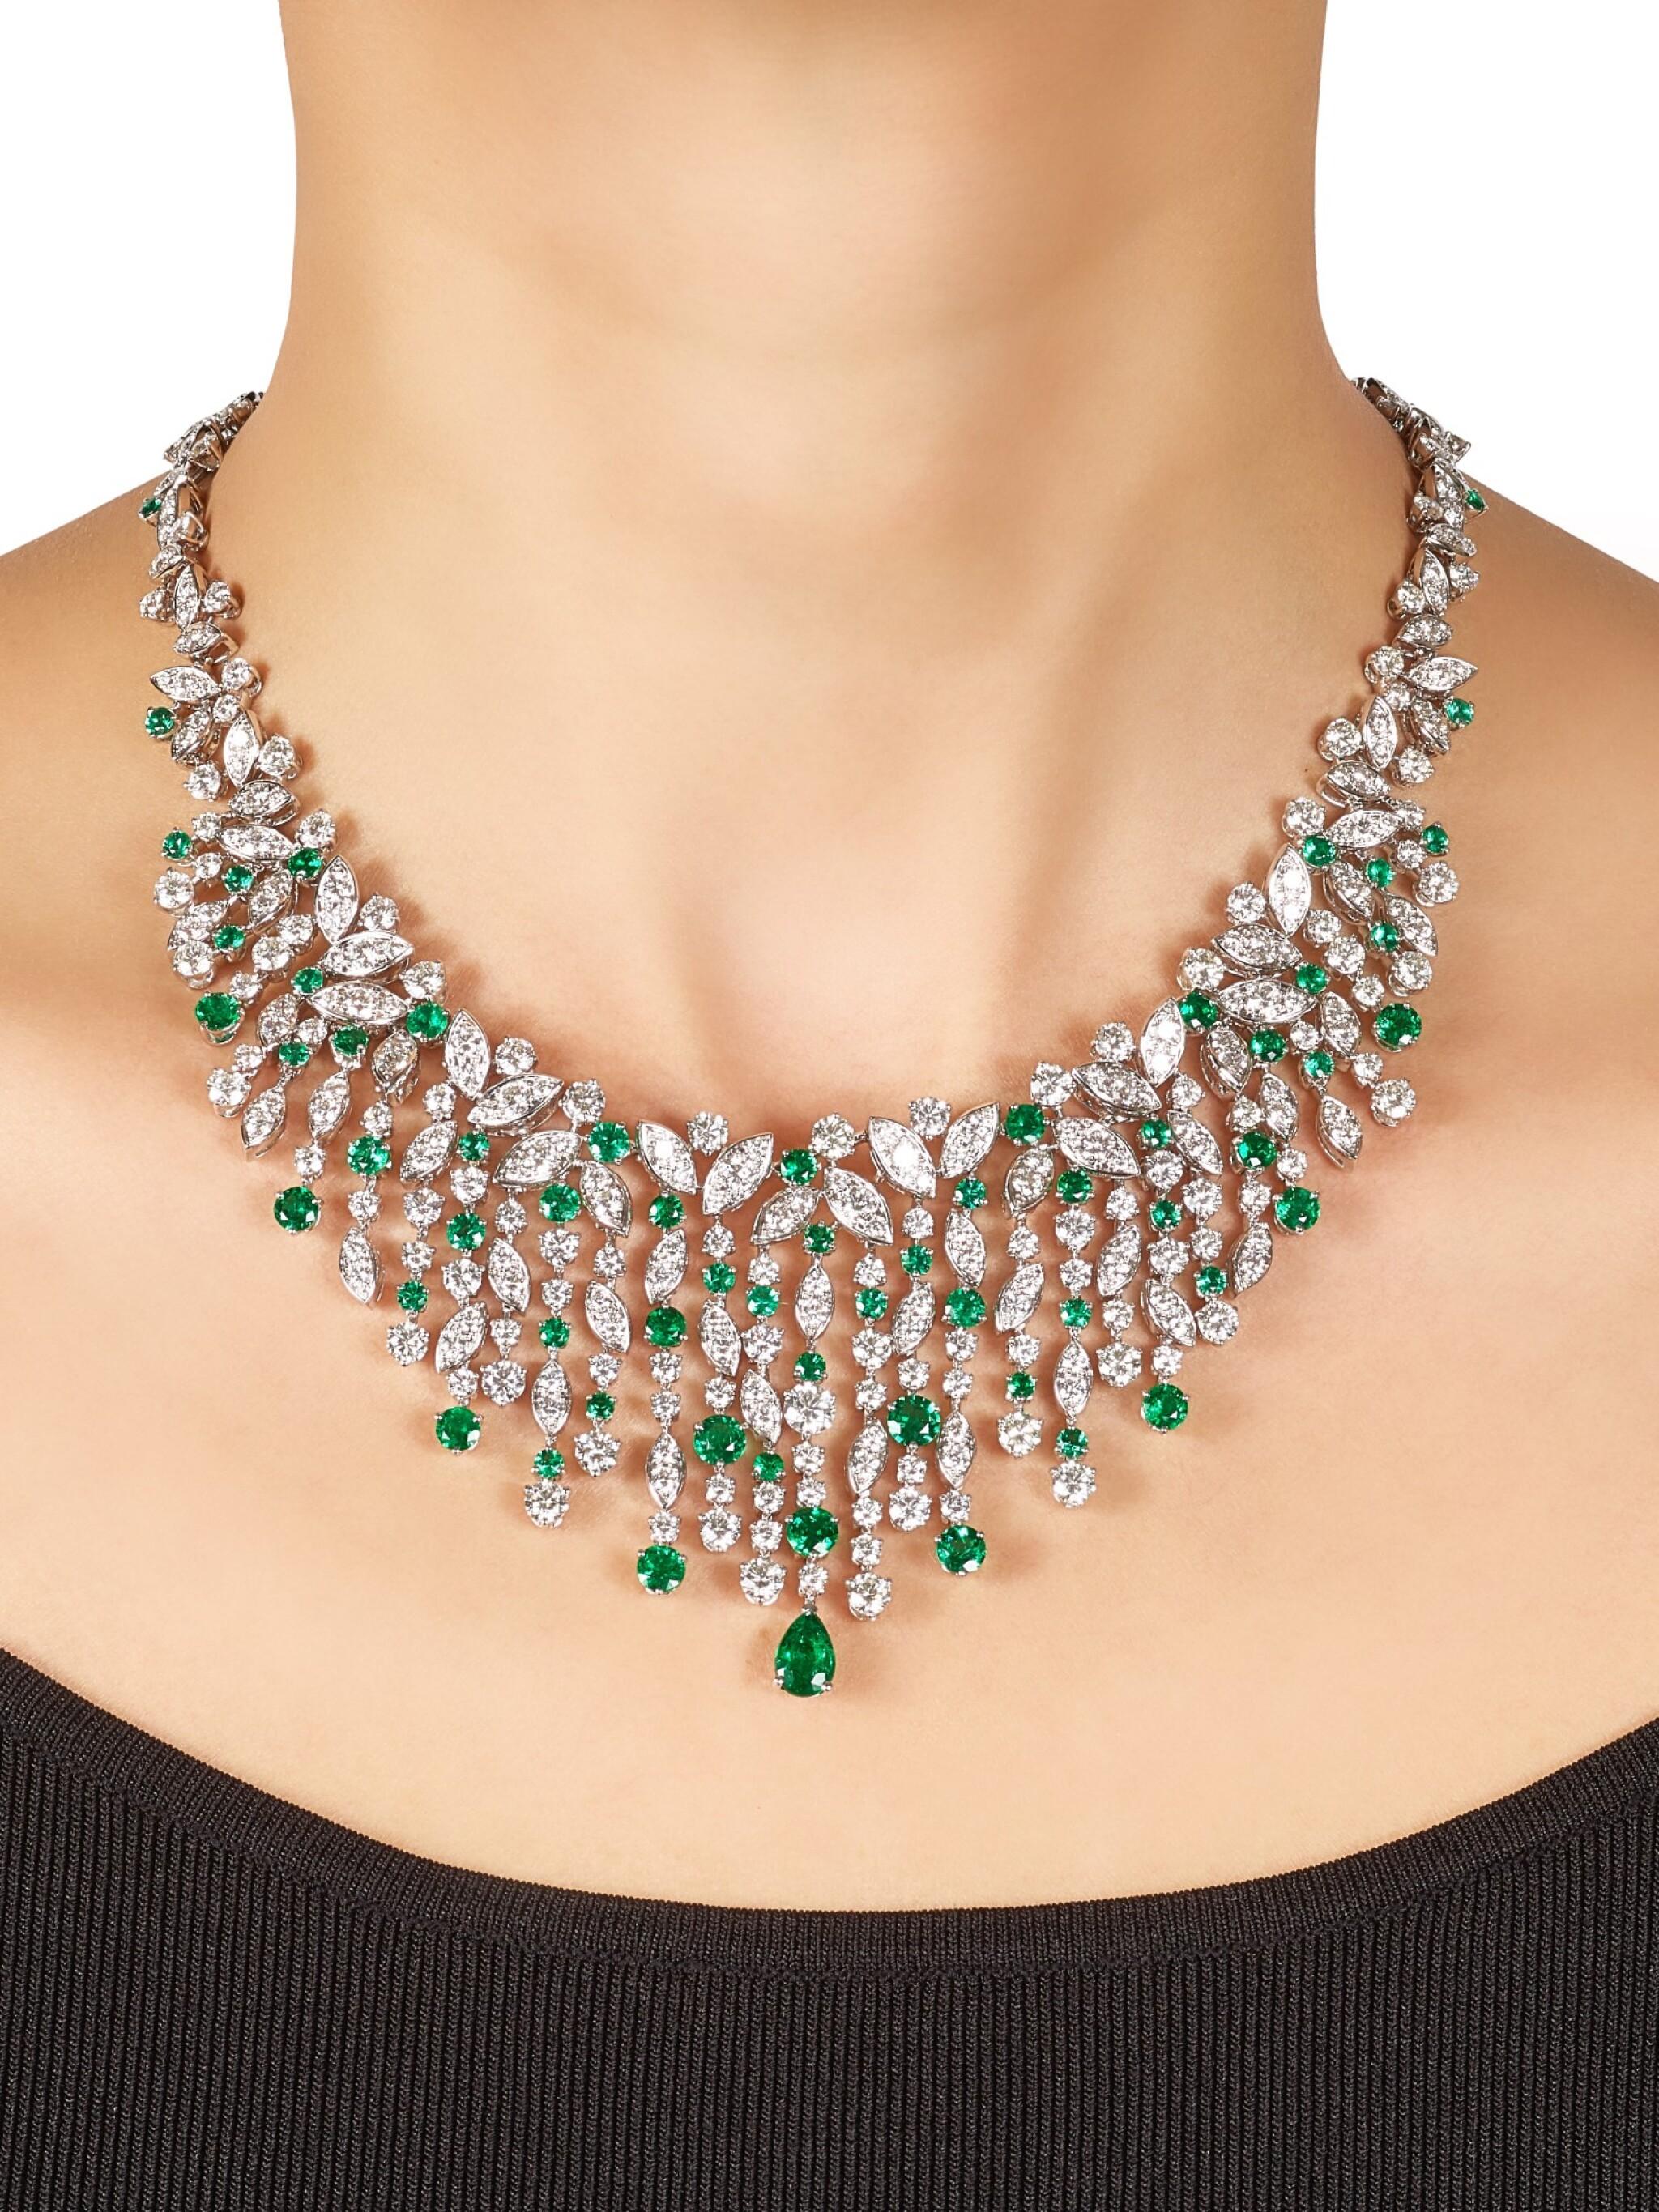 View full screen - View 1 of Lot 1037. 'Rhythm' Emerald and Diamond Necklace | 格拉夫| 'Rhythm' 祖母綠 配 鑽石 項鏈 (祖母綠及鑽石共重約12.20及34.80克拉).